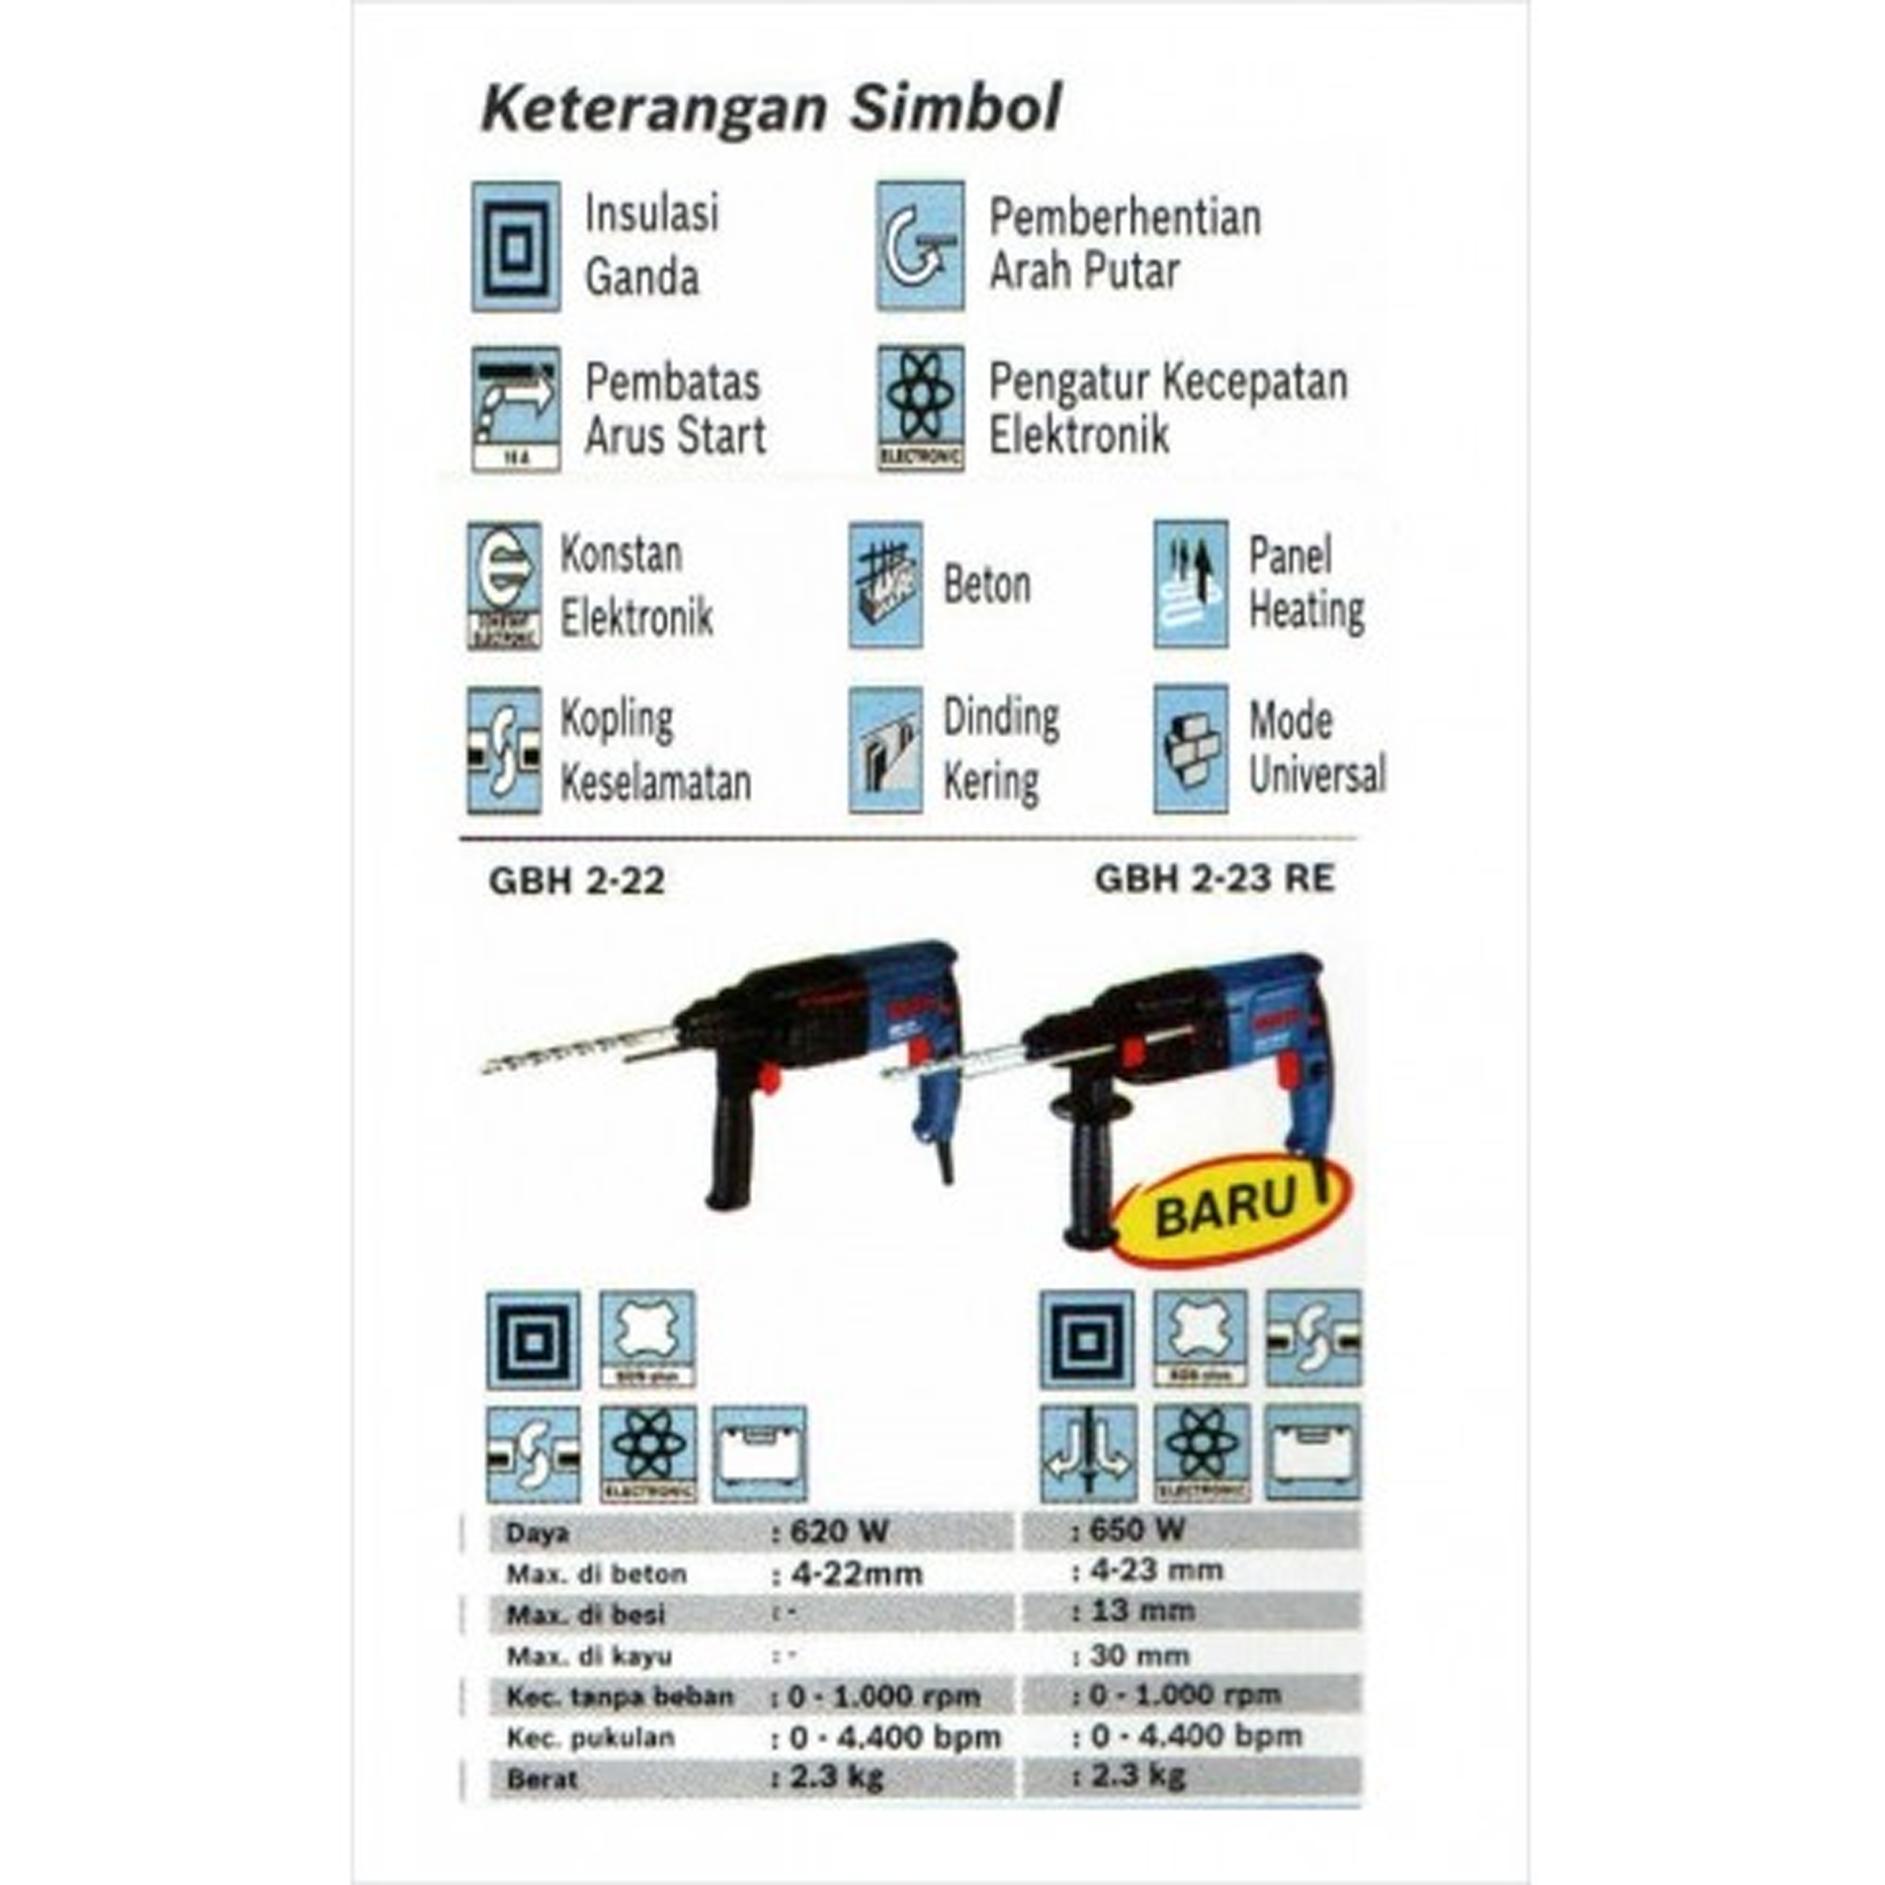 Harga Jual Bosch Gbh 2 22 Mesin Bor Tembok Rotary Hammer Professional 26 Dre Gallery Image Produk